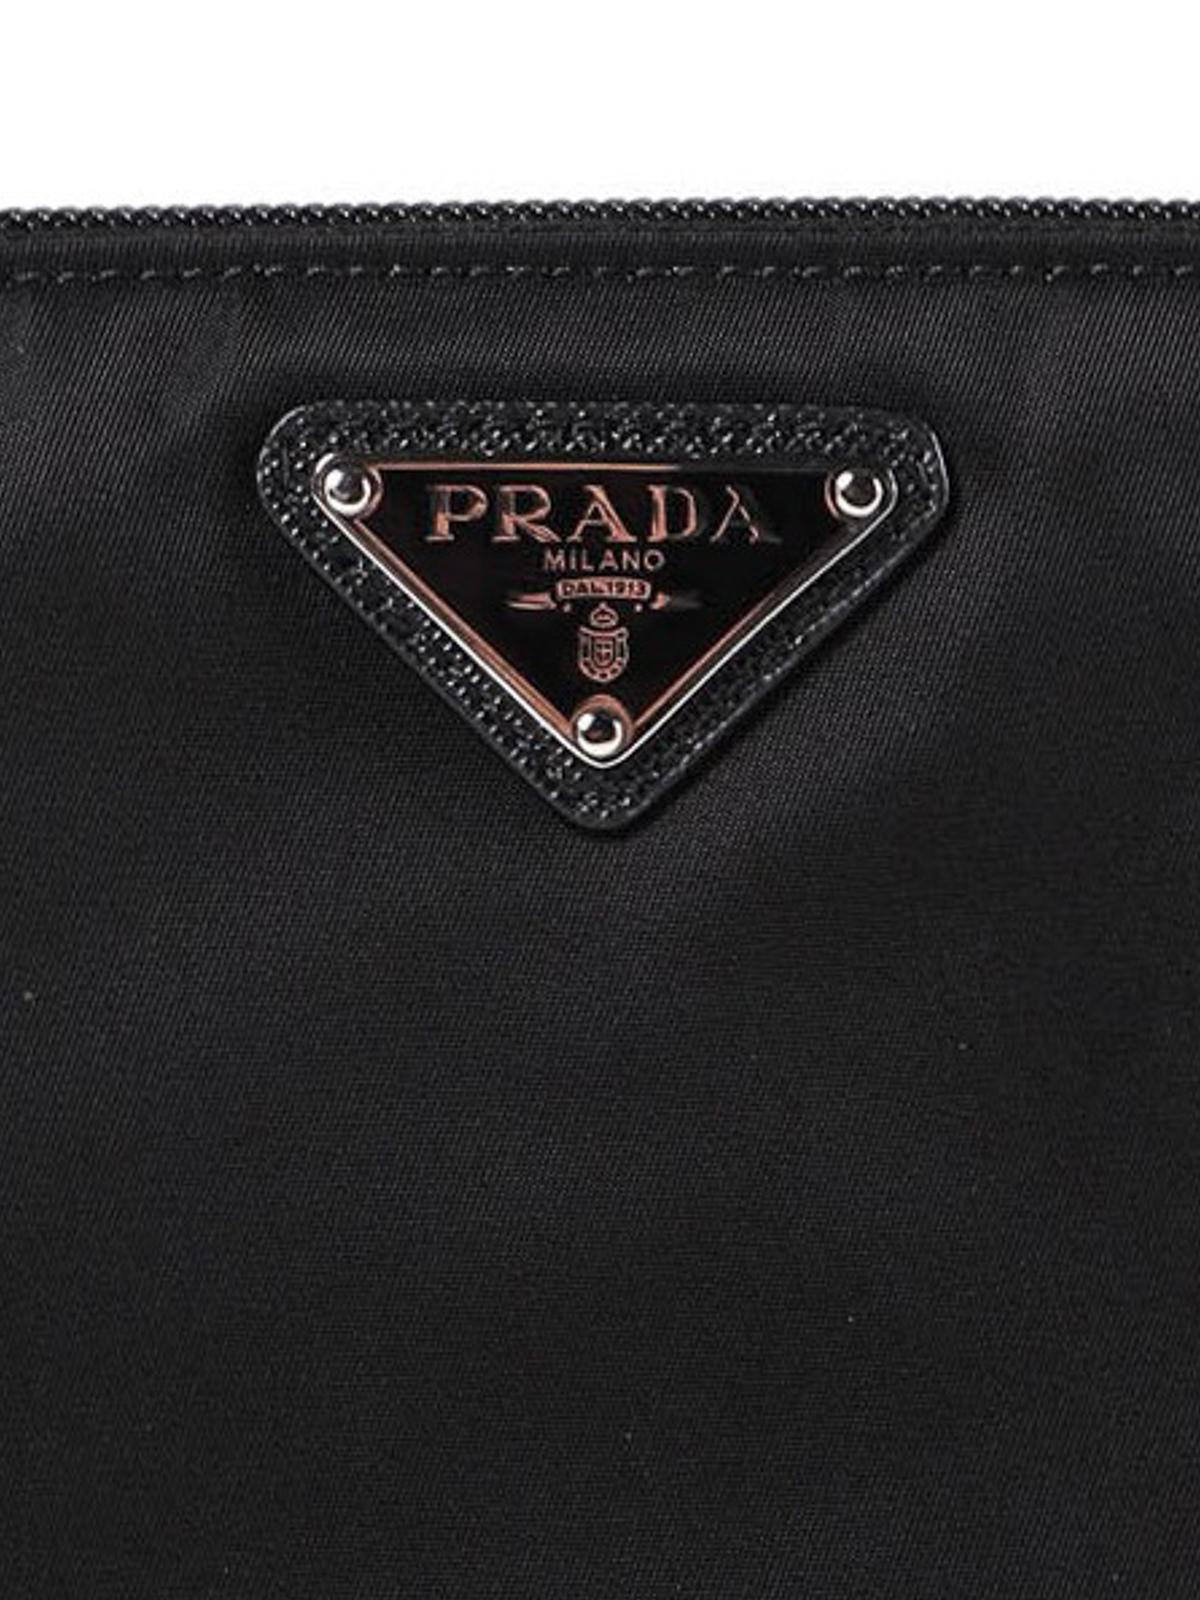 31dcc515111d Prada - Logo plaque nylon pouch - کلاچ - 2NA019064002 | iKRIX